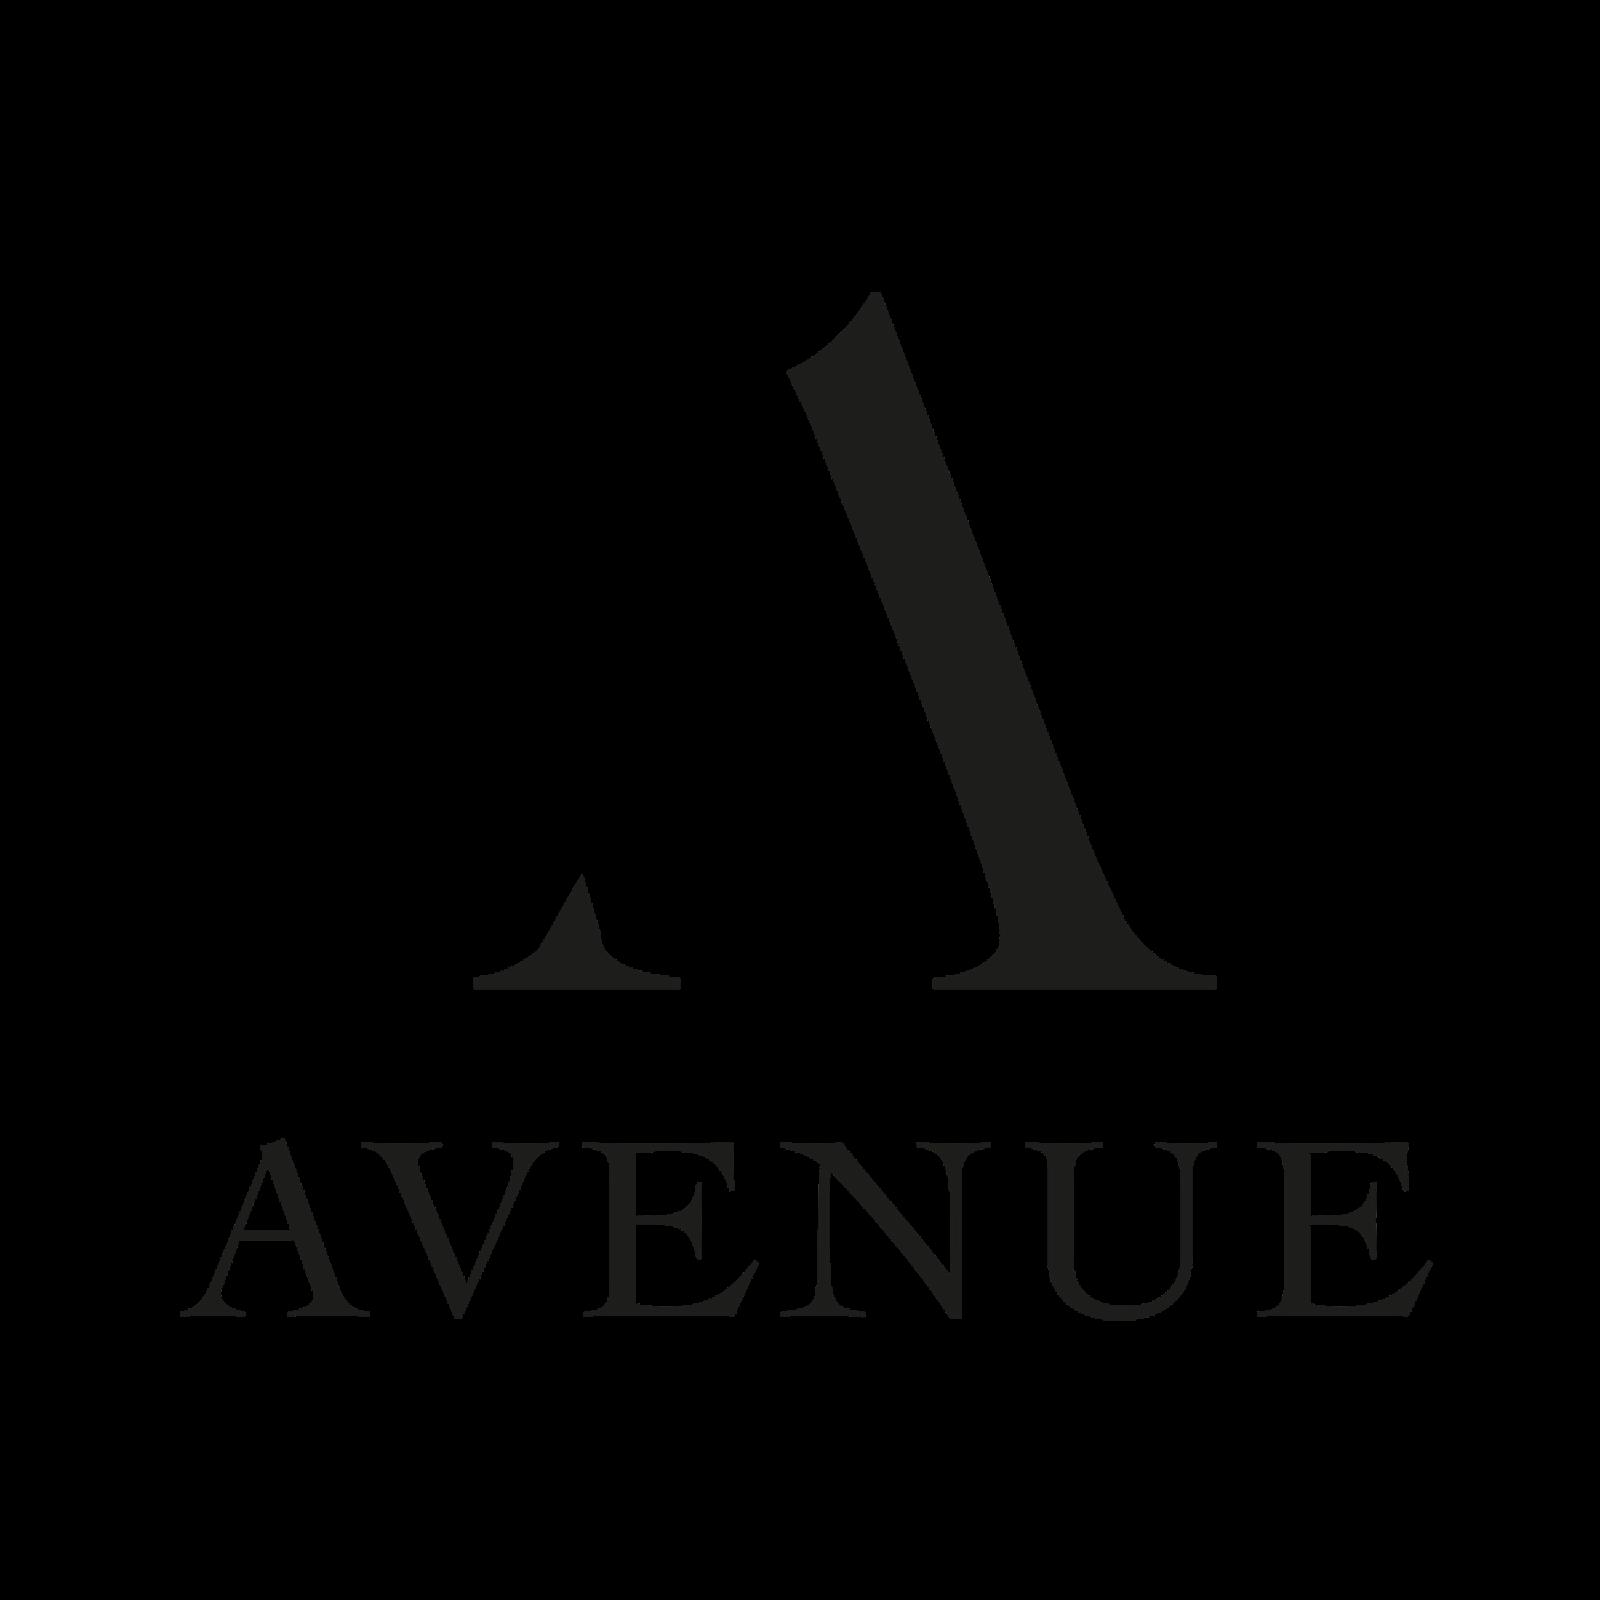 Avenue Logo Shade